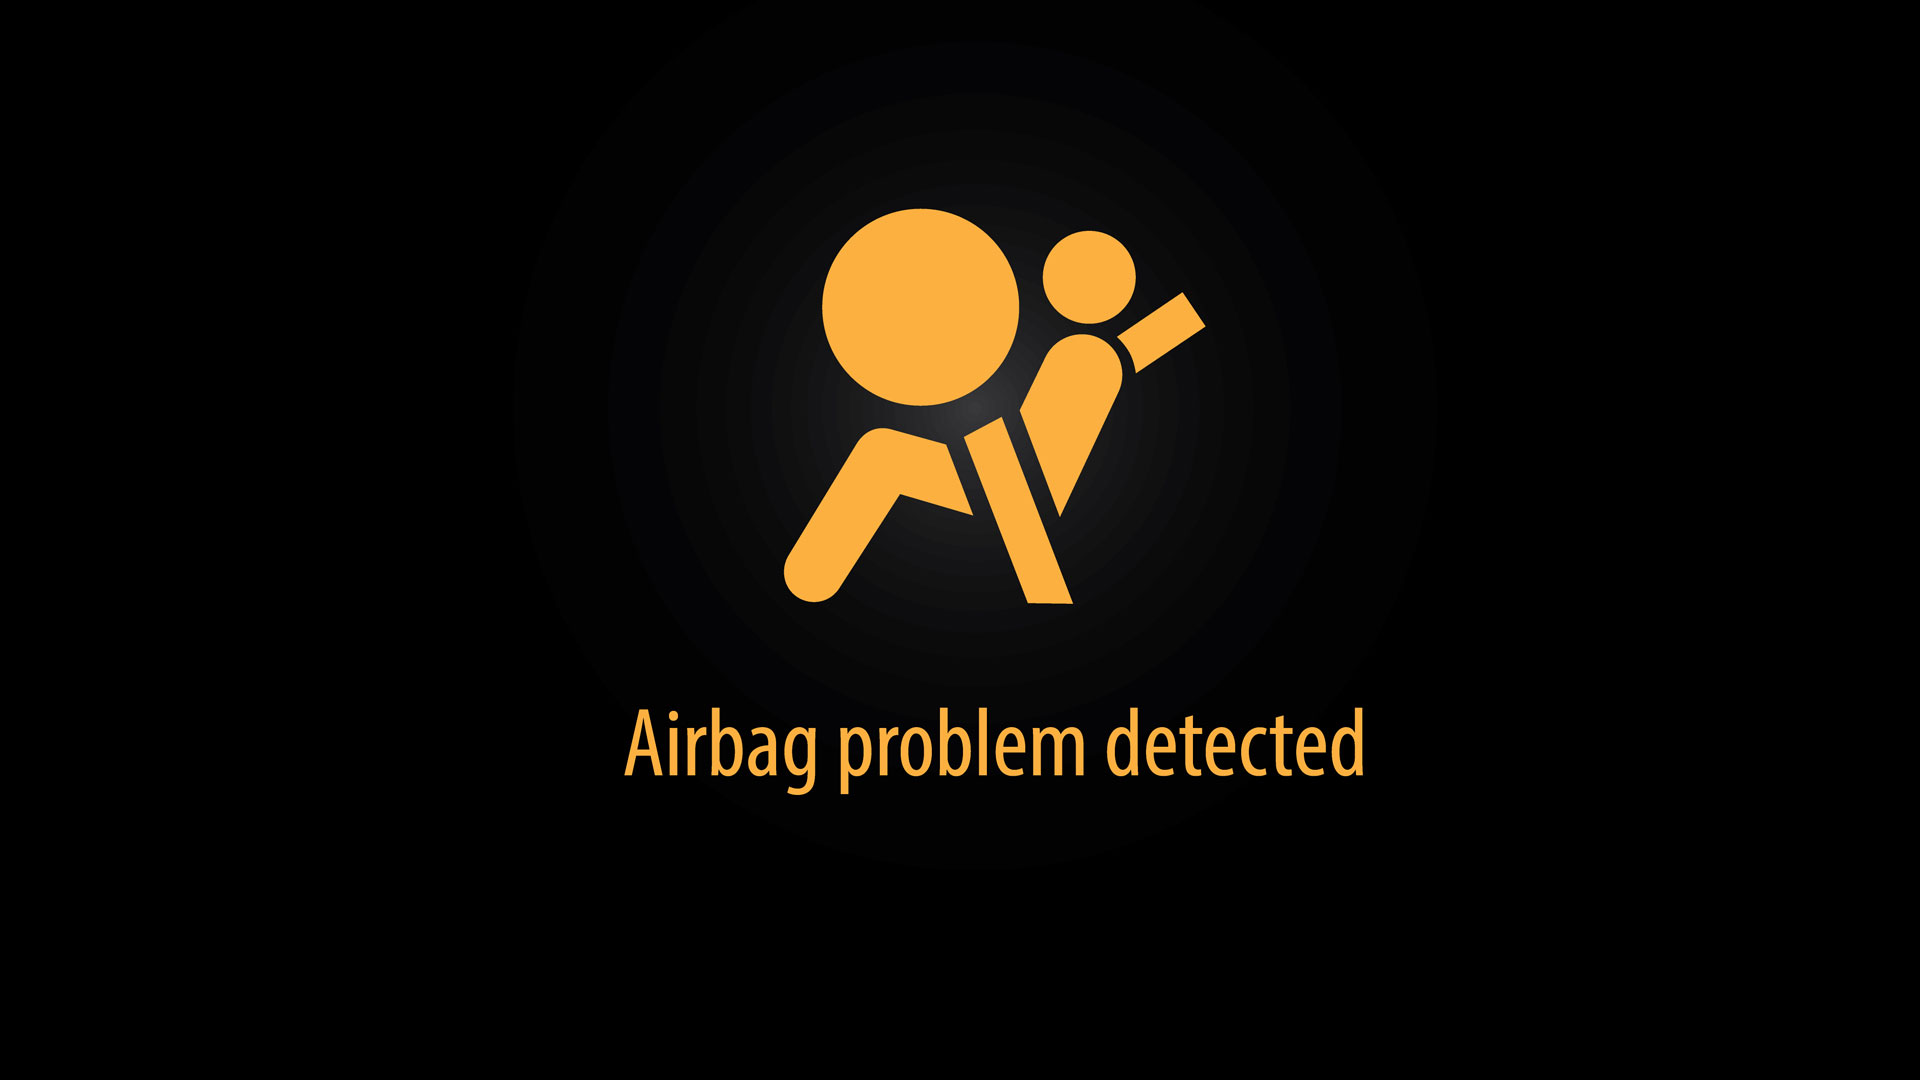 Airbag problem detected